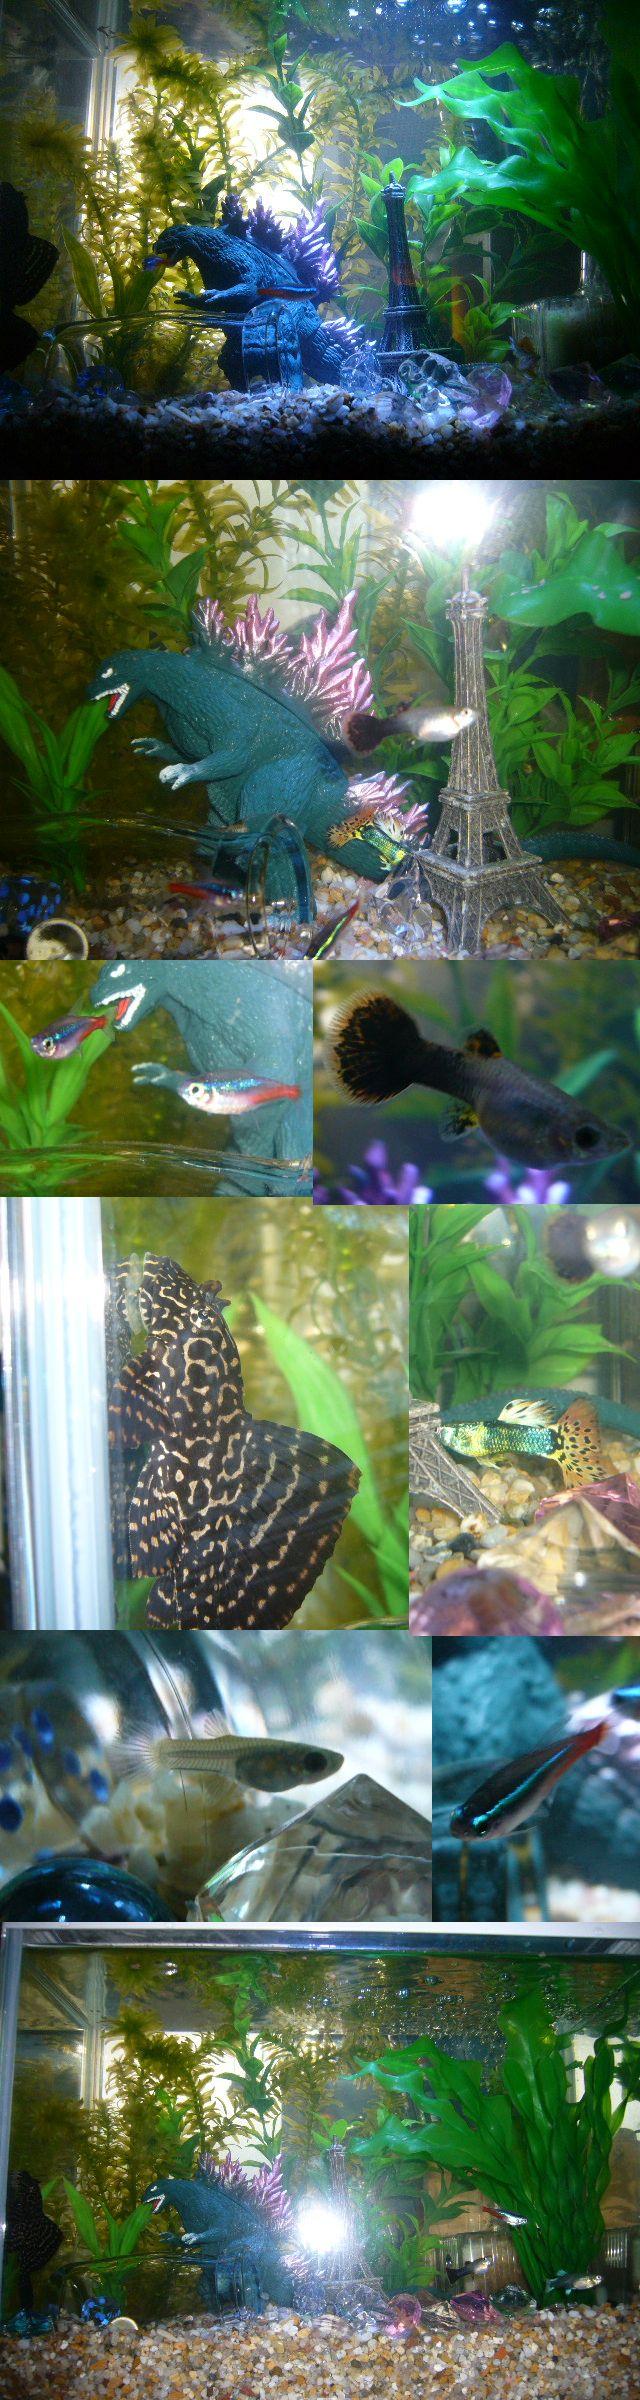 Fish aquarium edmonton - Godzilla Attacks Underwater Paris Fish Tank Theme By Gingaakam